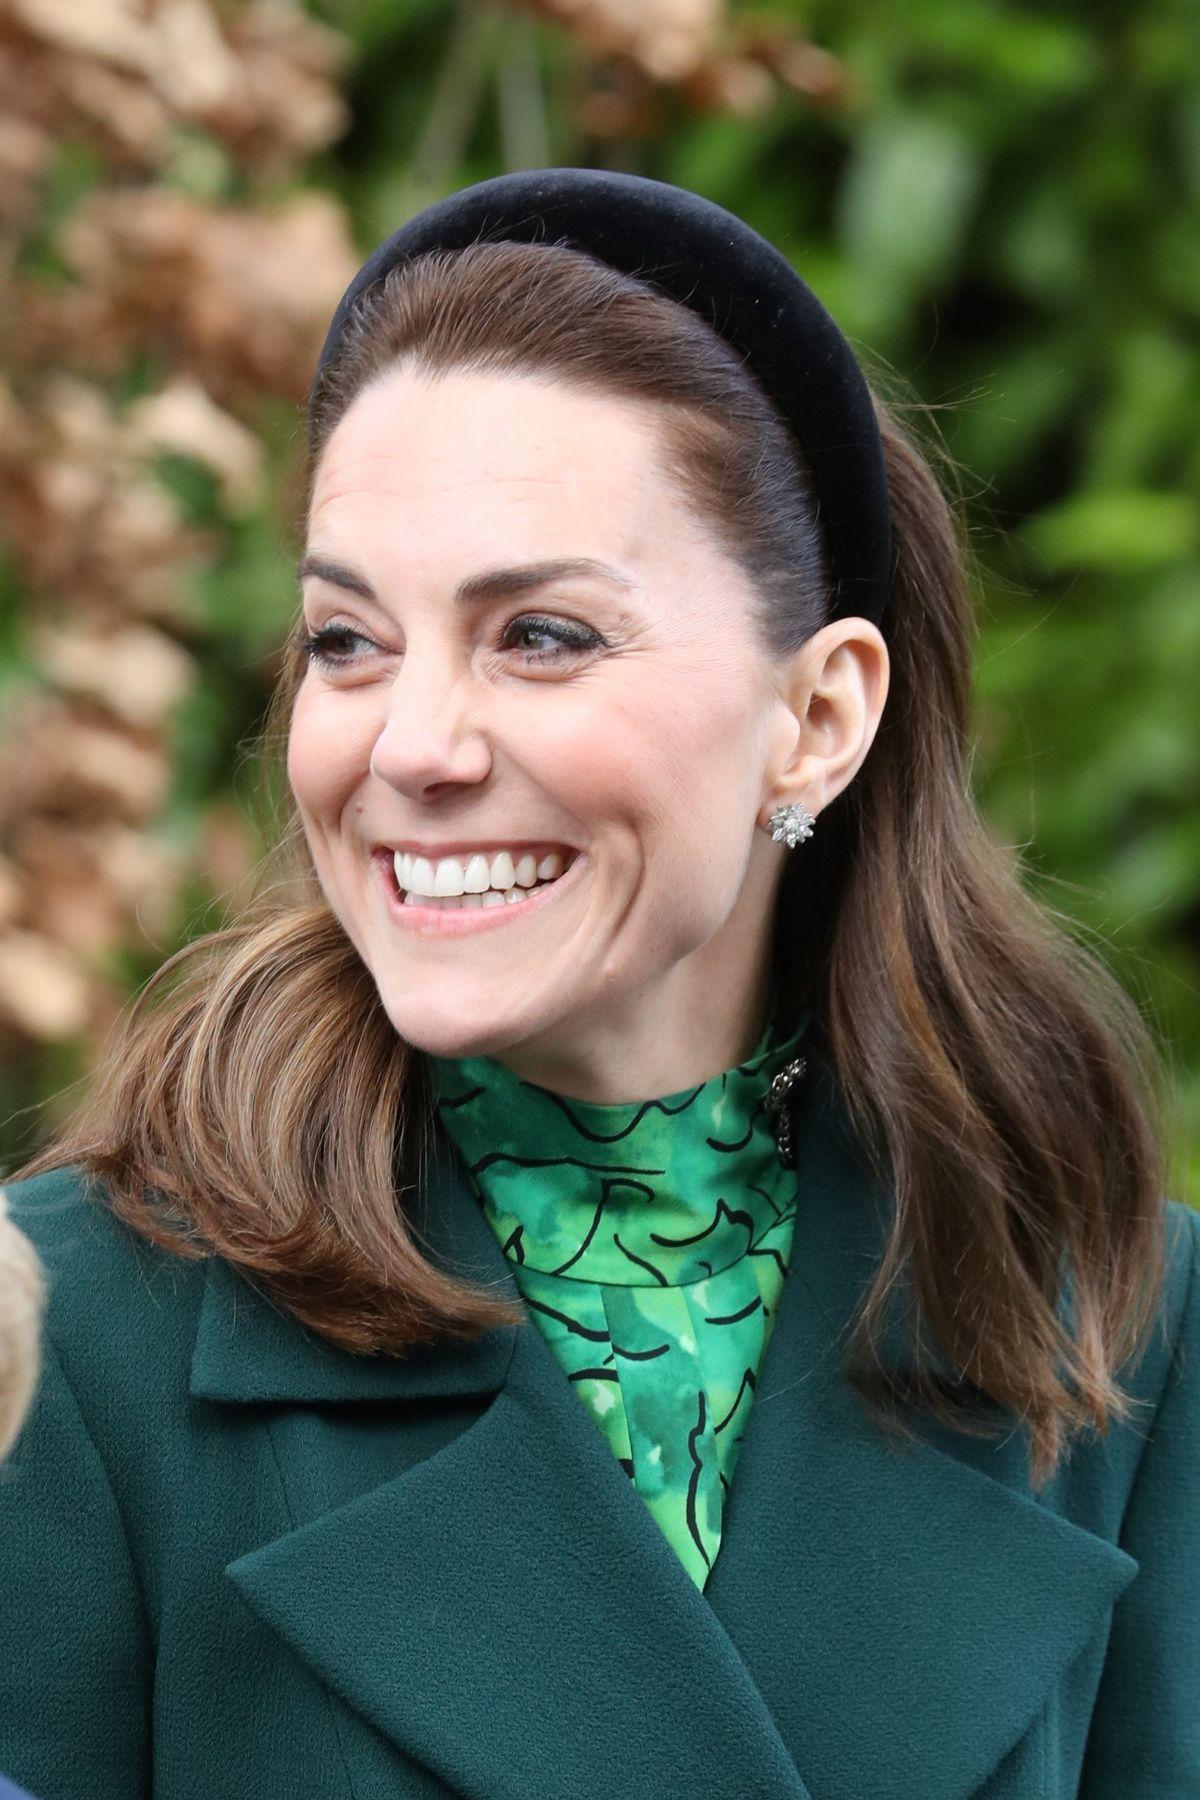 KATE MIDDLETON at Her Royal Visit in Dublin 03/03/2020 ...